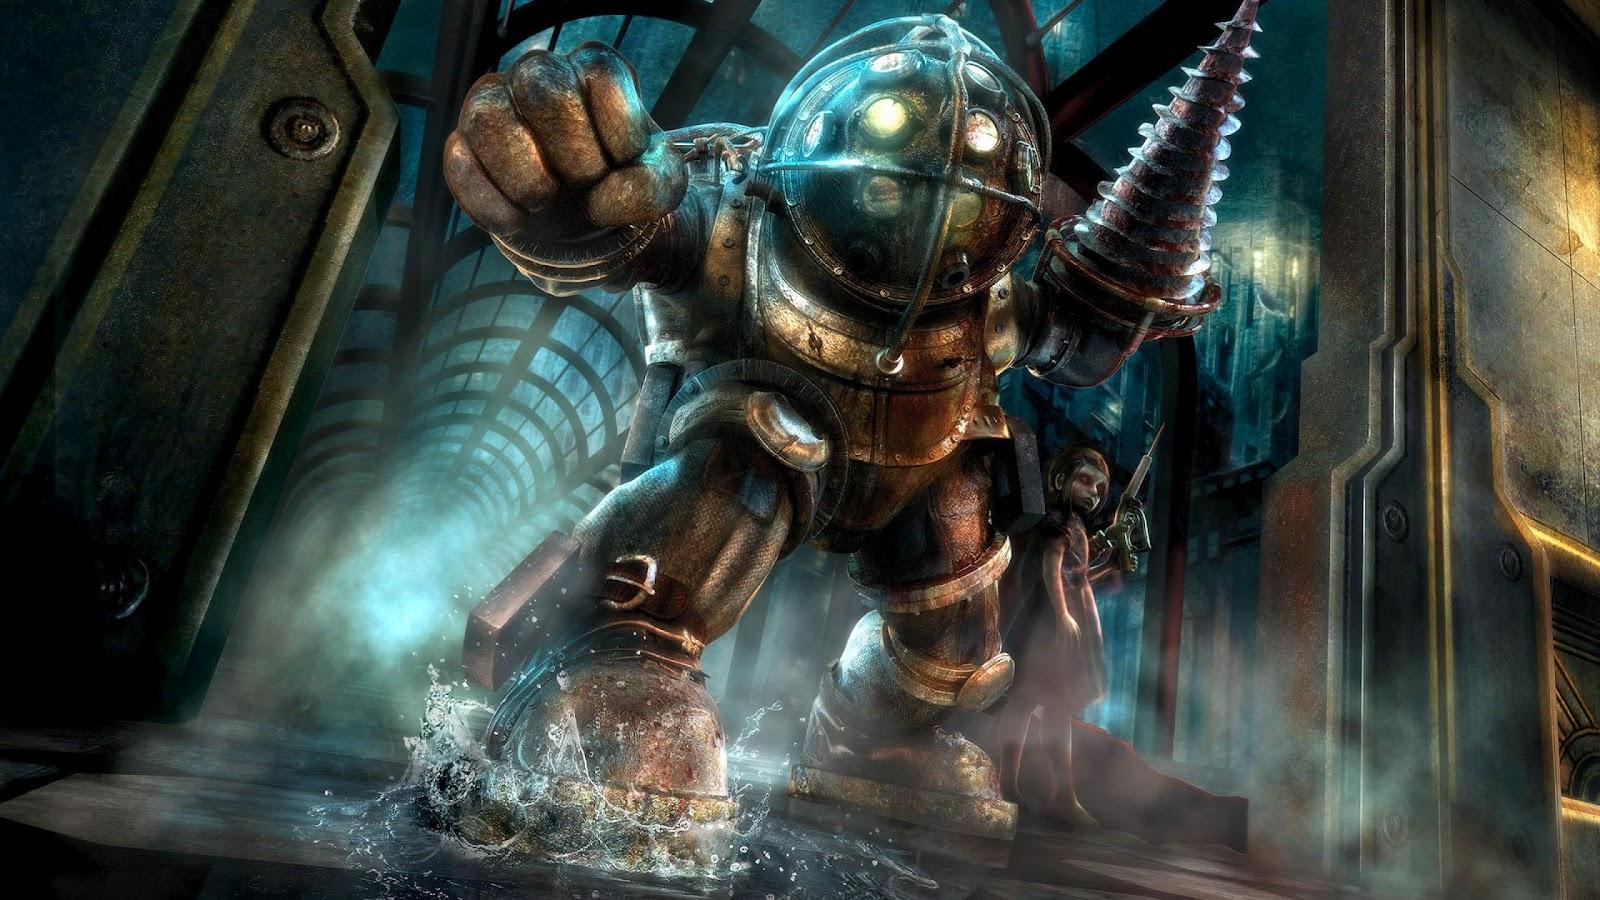 http://1.bp.blogspot.com/-zITWNpxbNI0/UBdOnArz2_I/AAAAAAAAIoY/dmxD5T3PtP0/s1600/Bioshock-bioshock-games-wallpaper-cool-bigdaddy-2560x1440.jpg